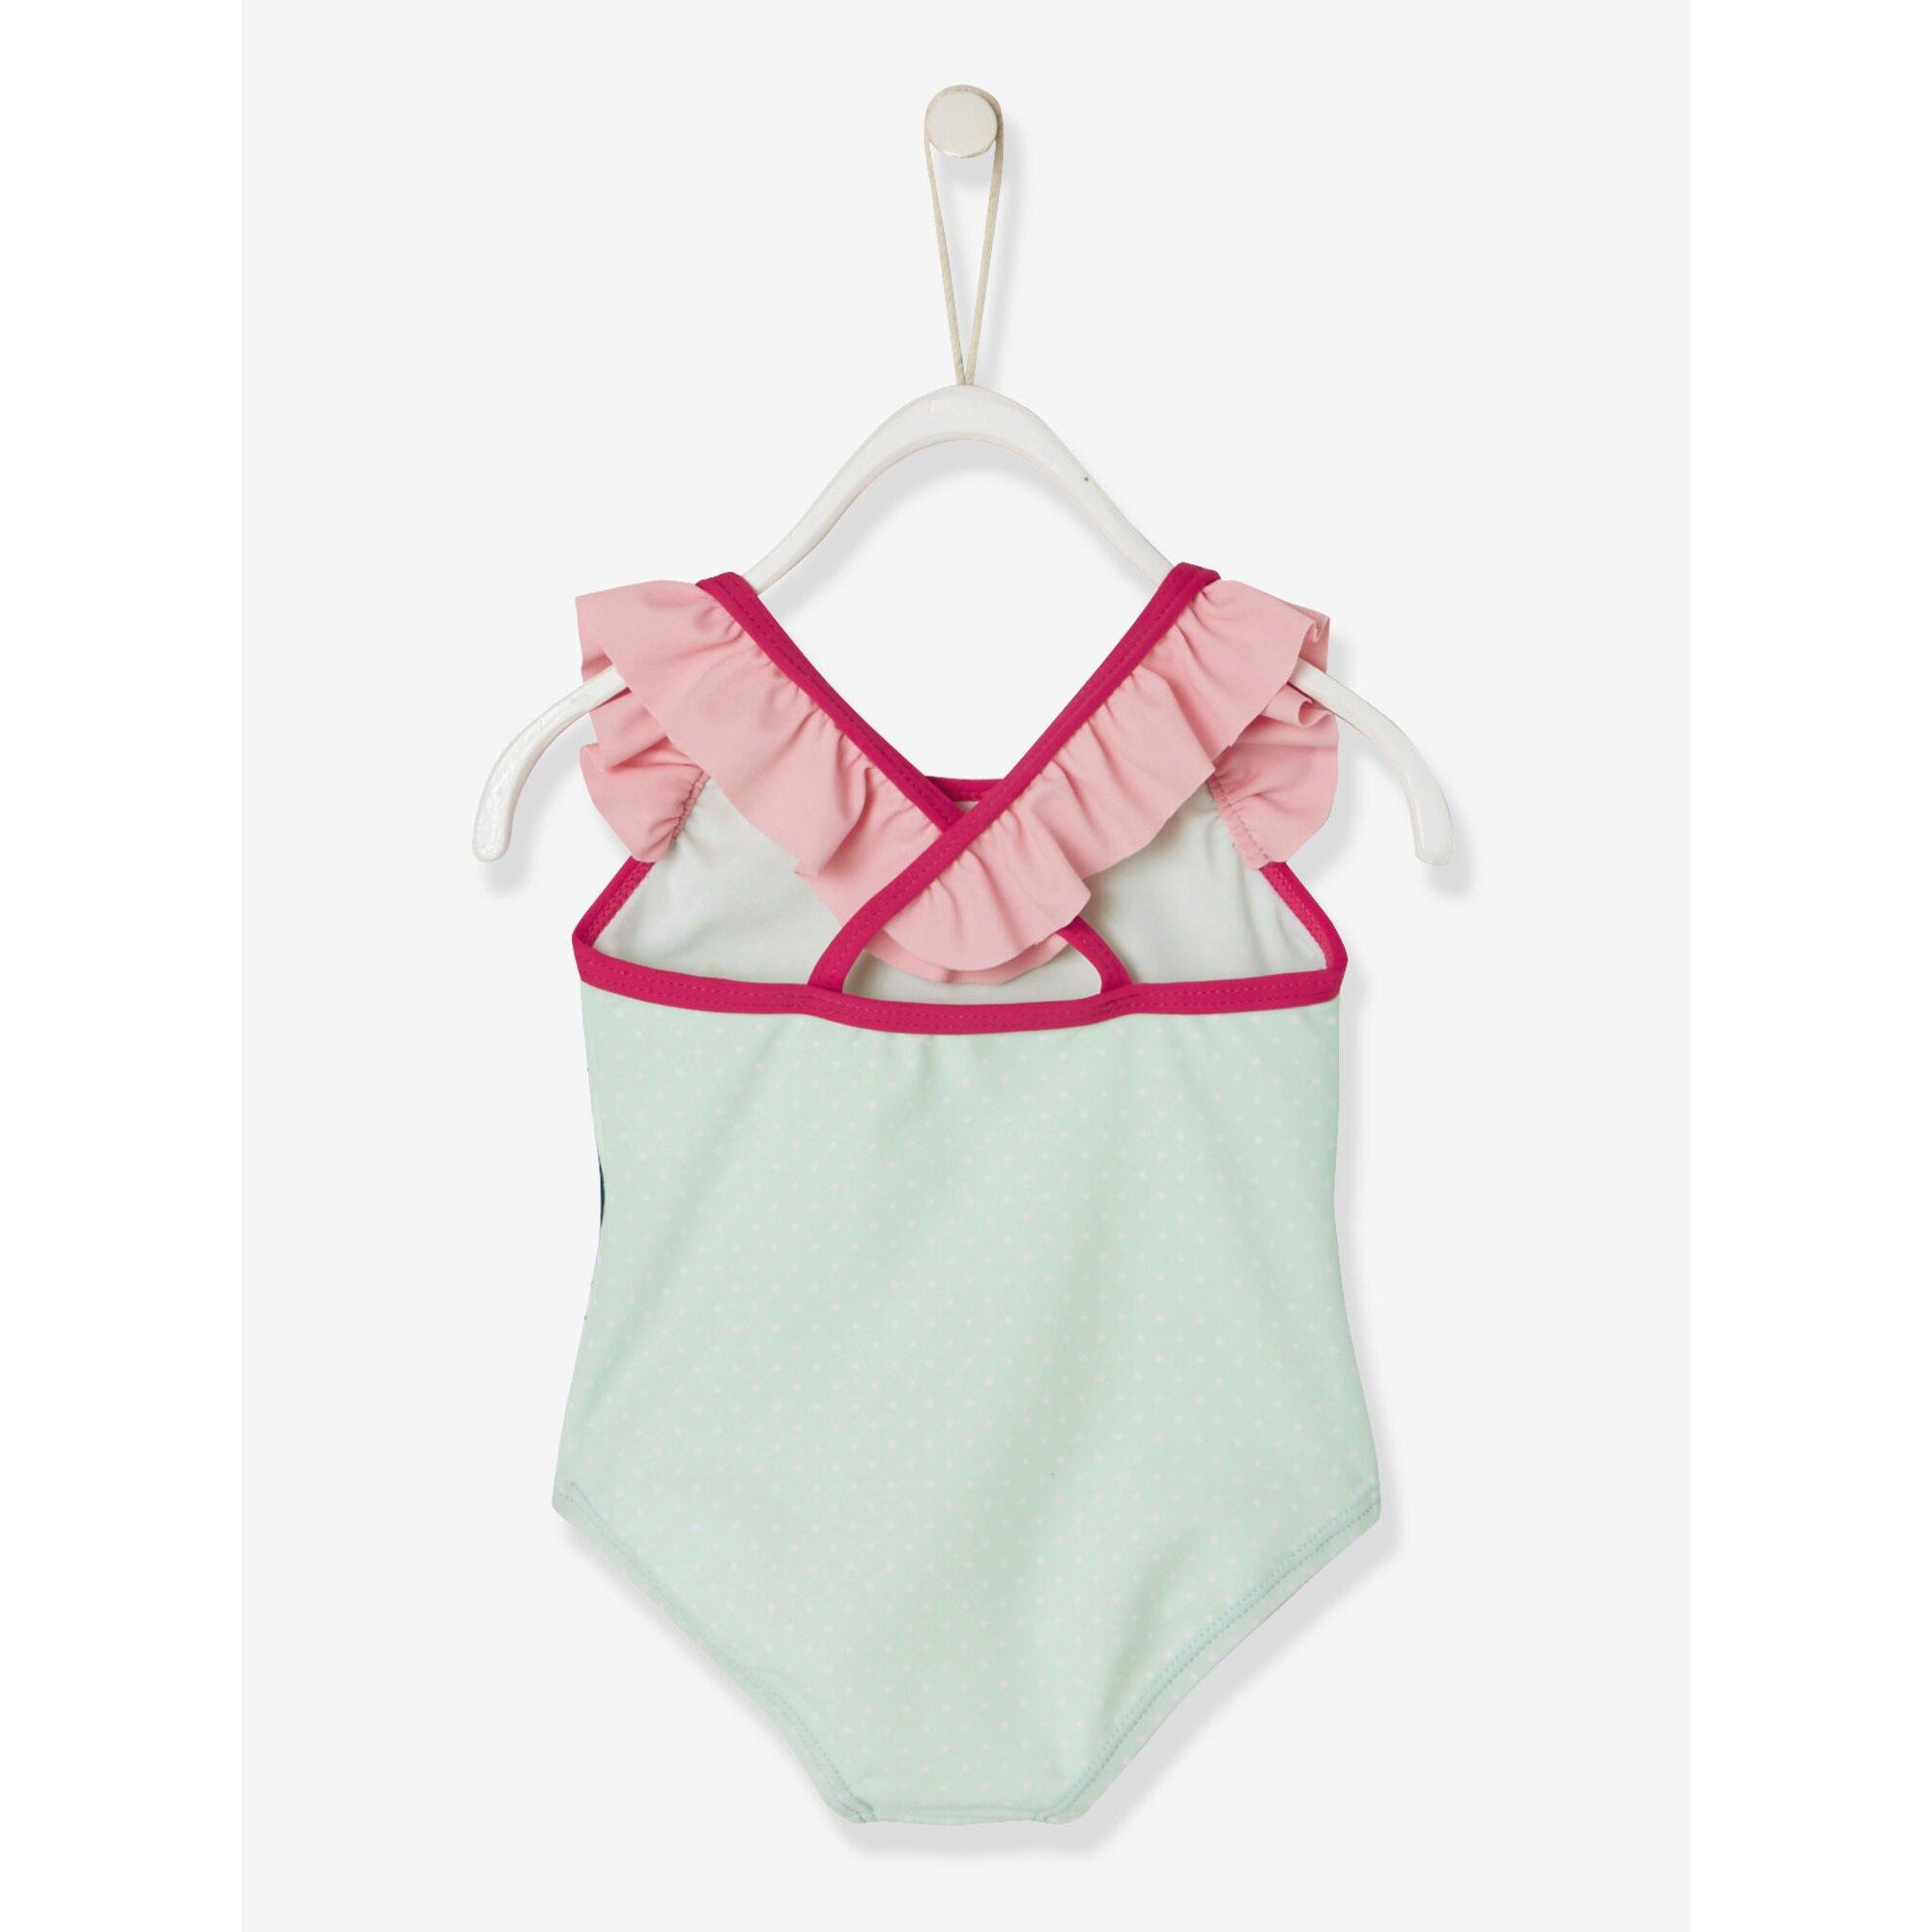 vertbaudet-badeanzug-fur-baby-madchen, 13.99 EUR @ babywalz-de